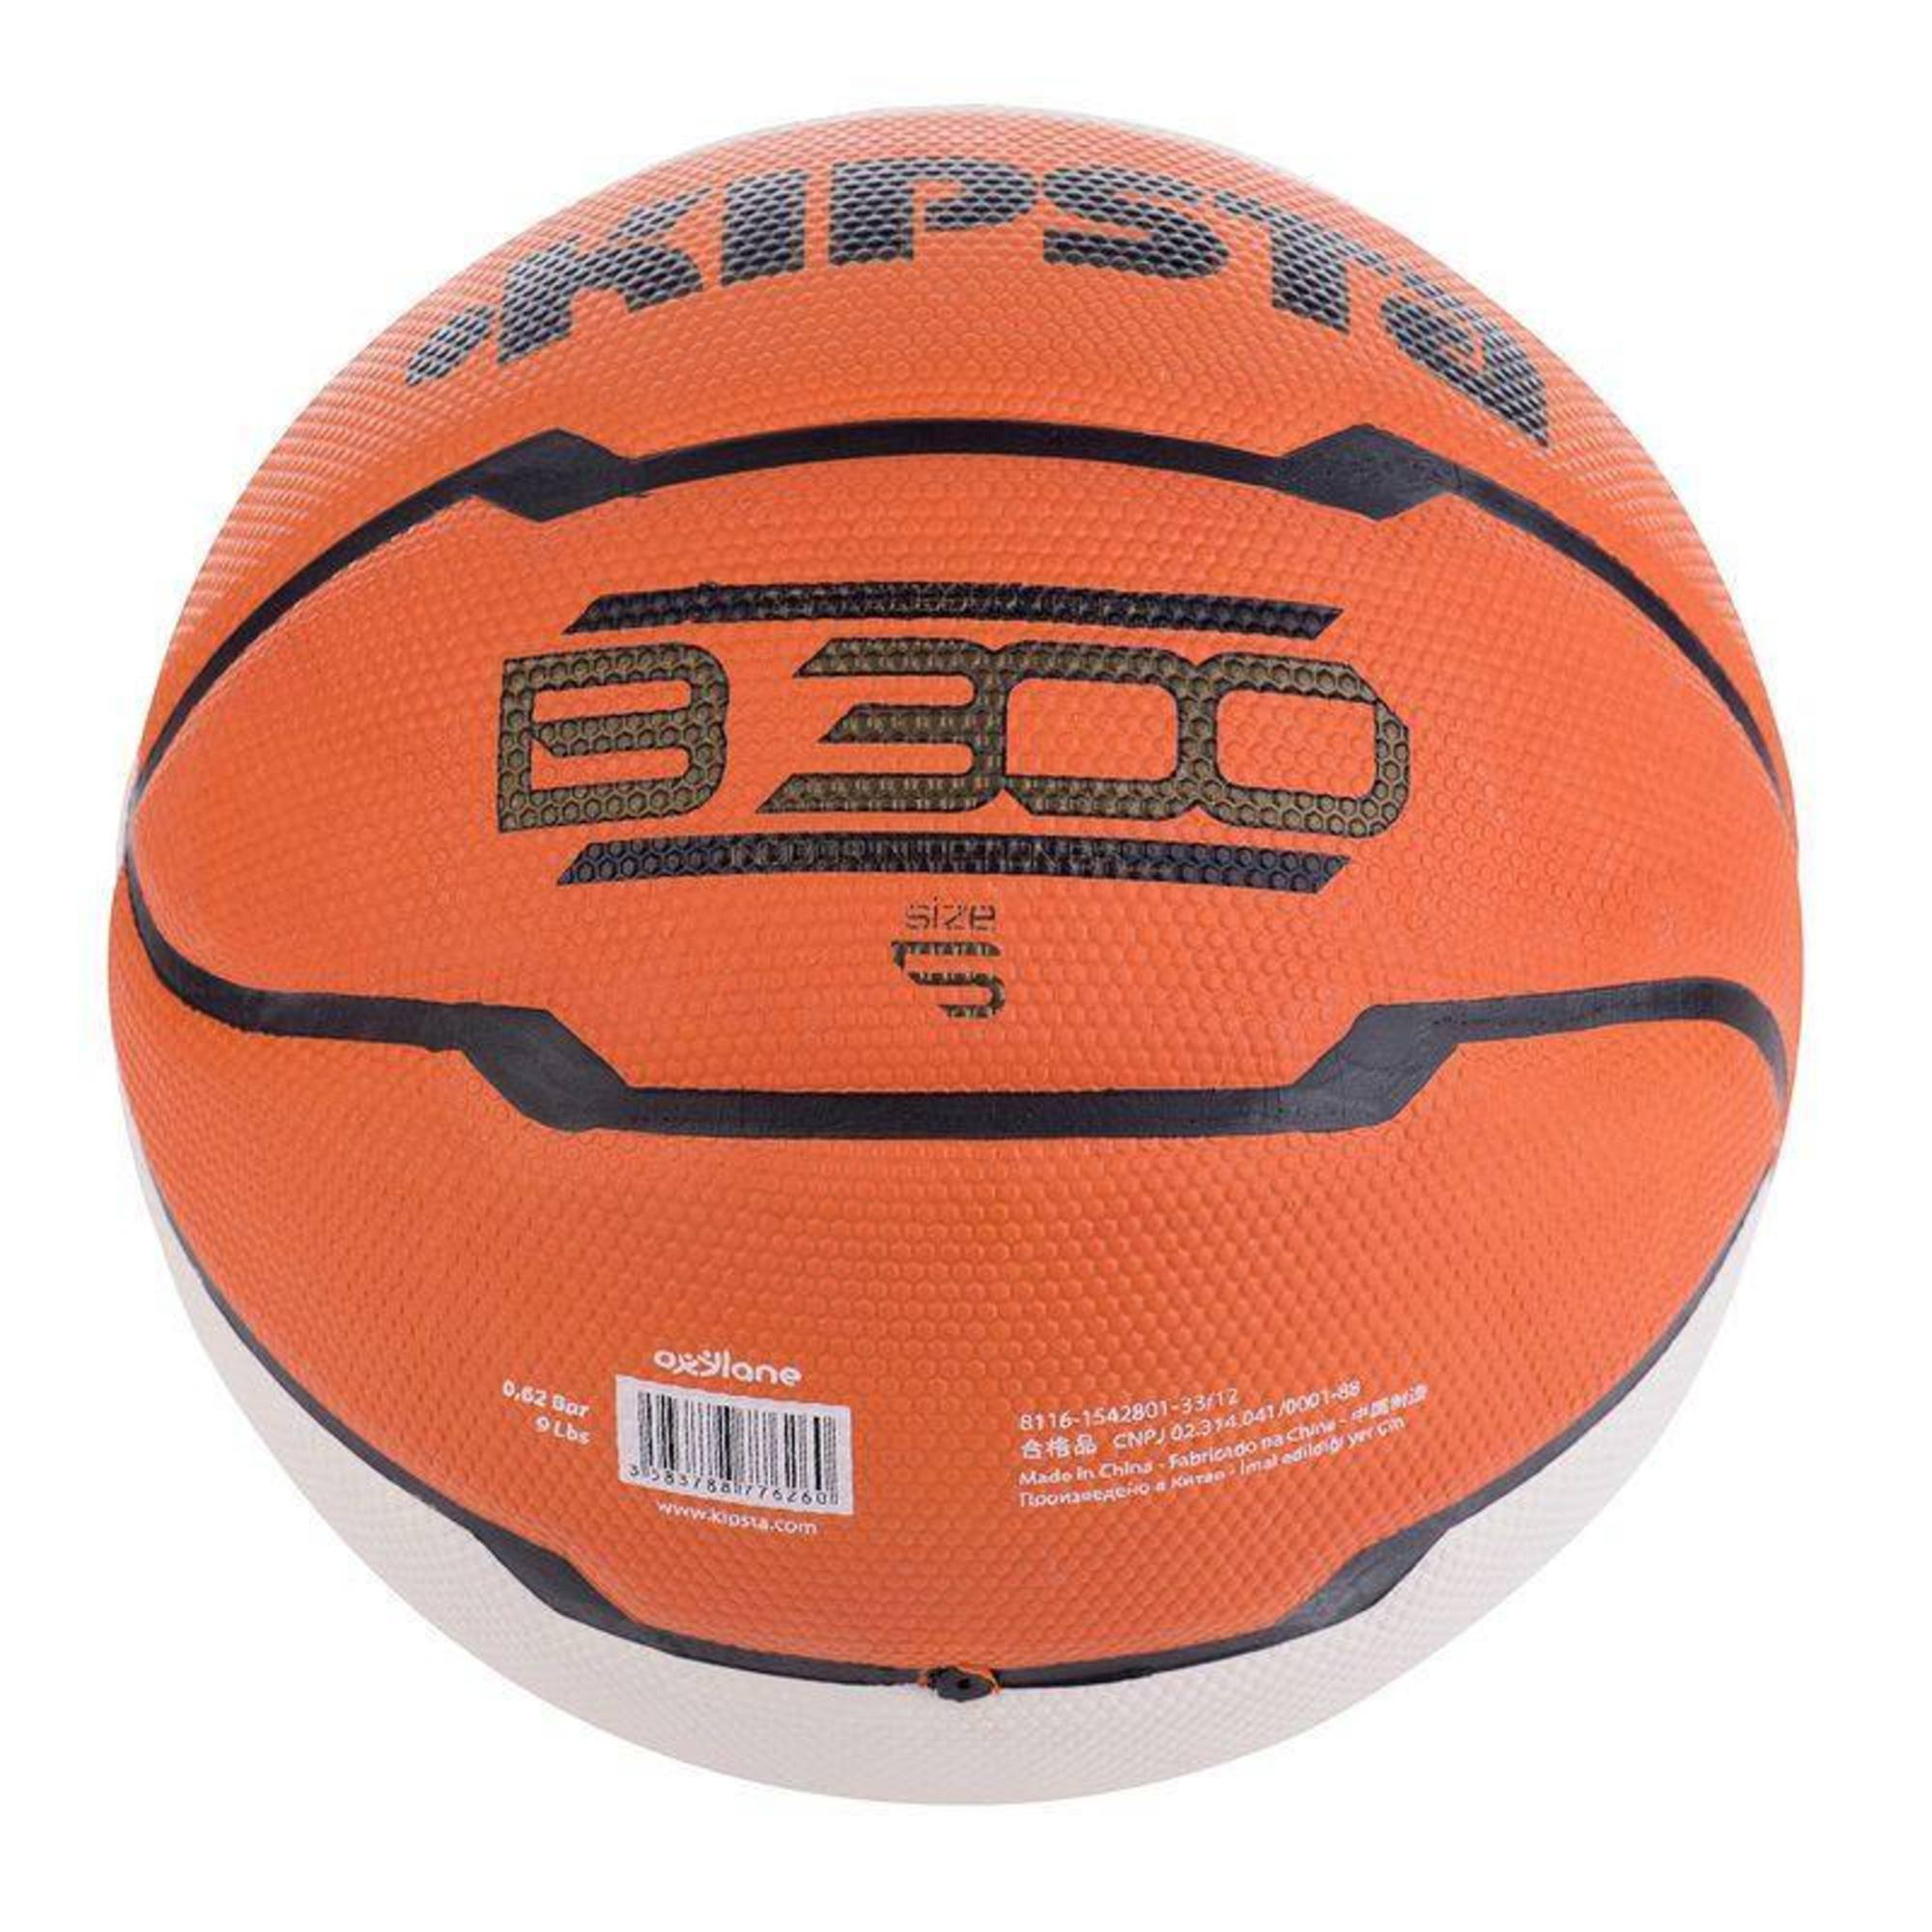 Ballon basket ball b300 taille 5 entrainement clubs collectivit s decathlon pro - Ballon basket decathlon ...